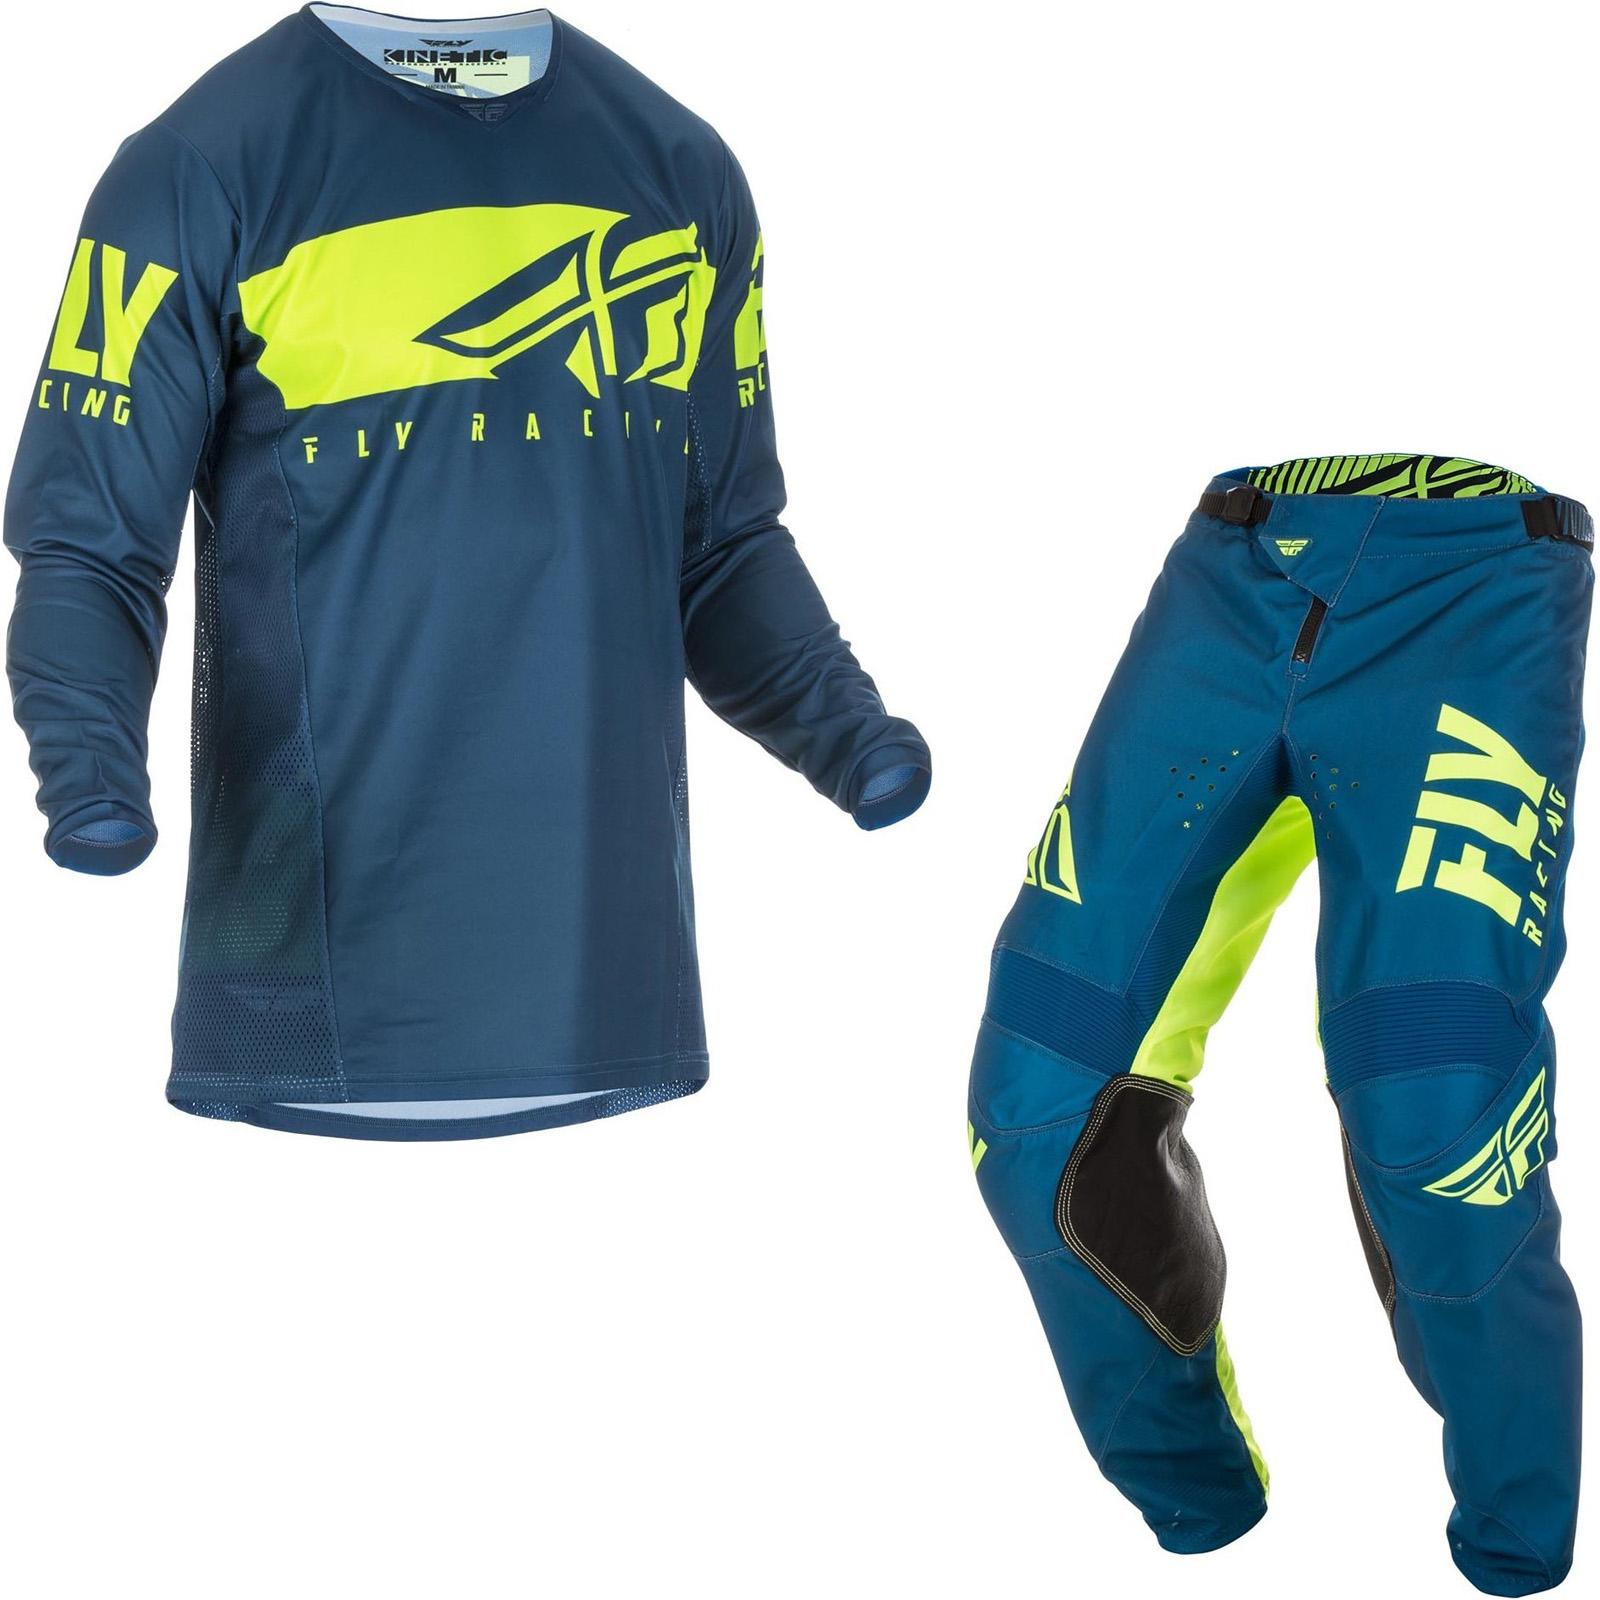 NEW Fly Racing 2019 MX Kinetic Noiz Black Hi-Vis Jersey Pants Motocross Gear Set